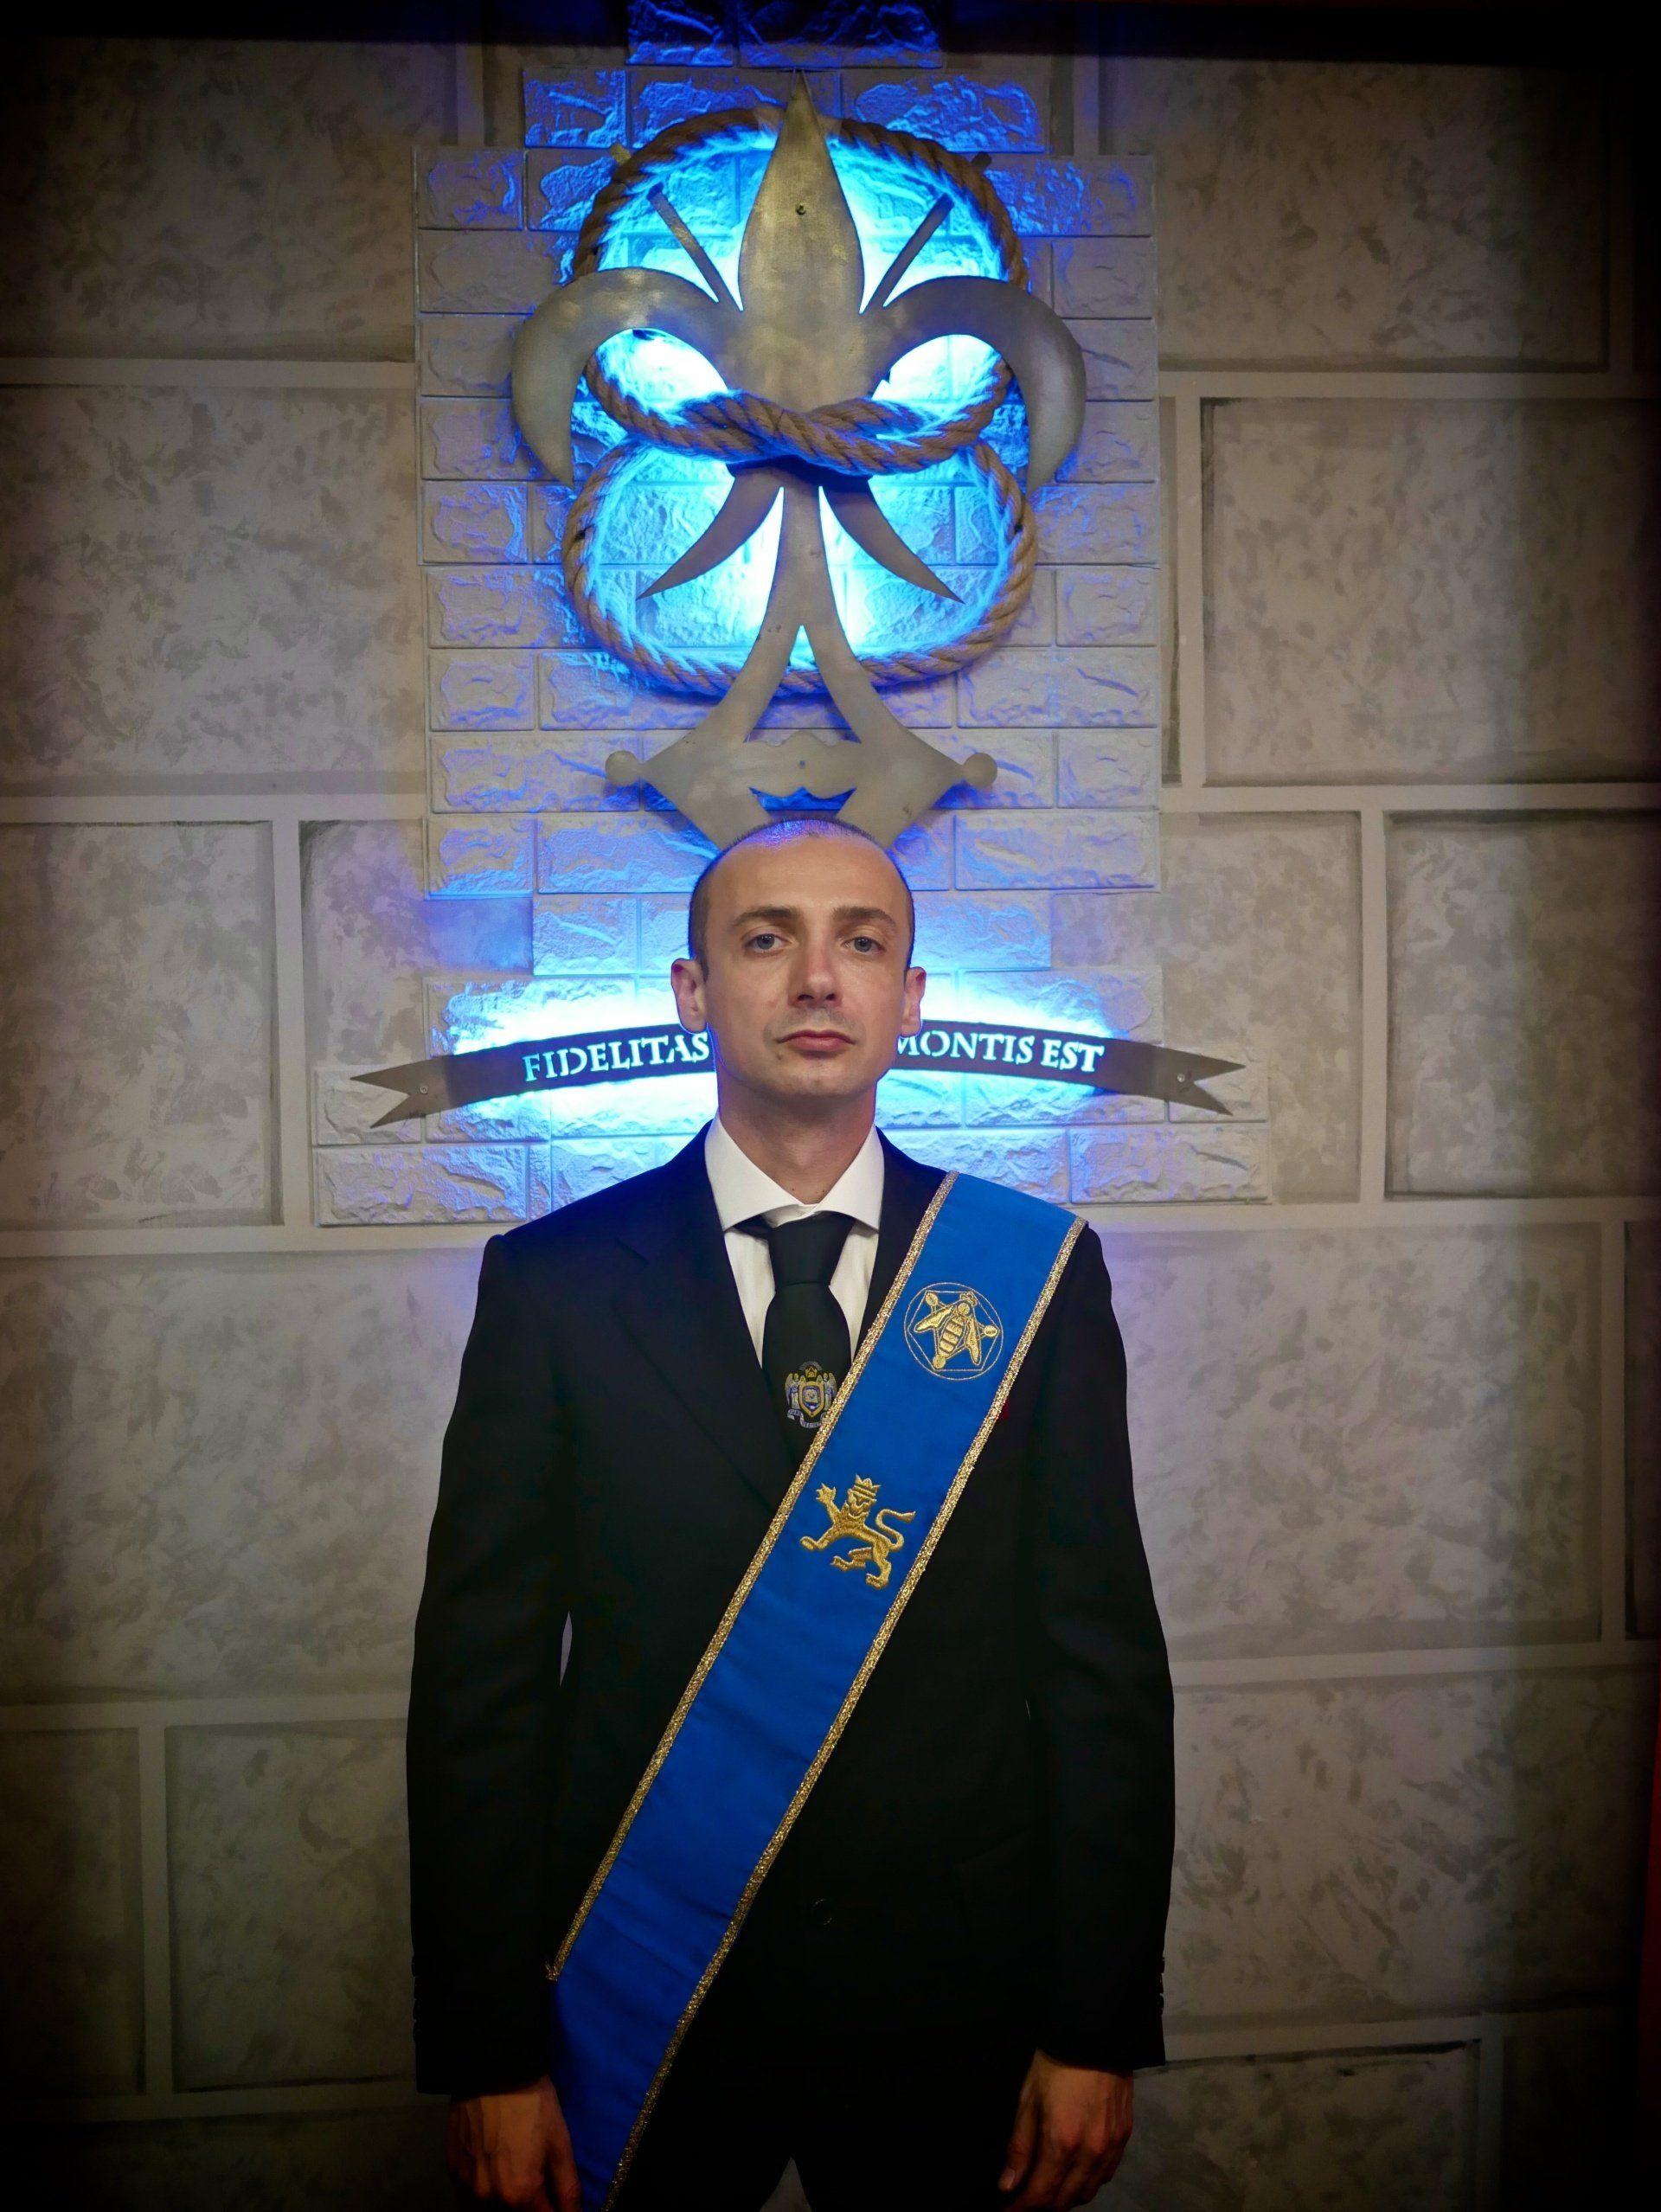 Marco Rigamonti